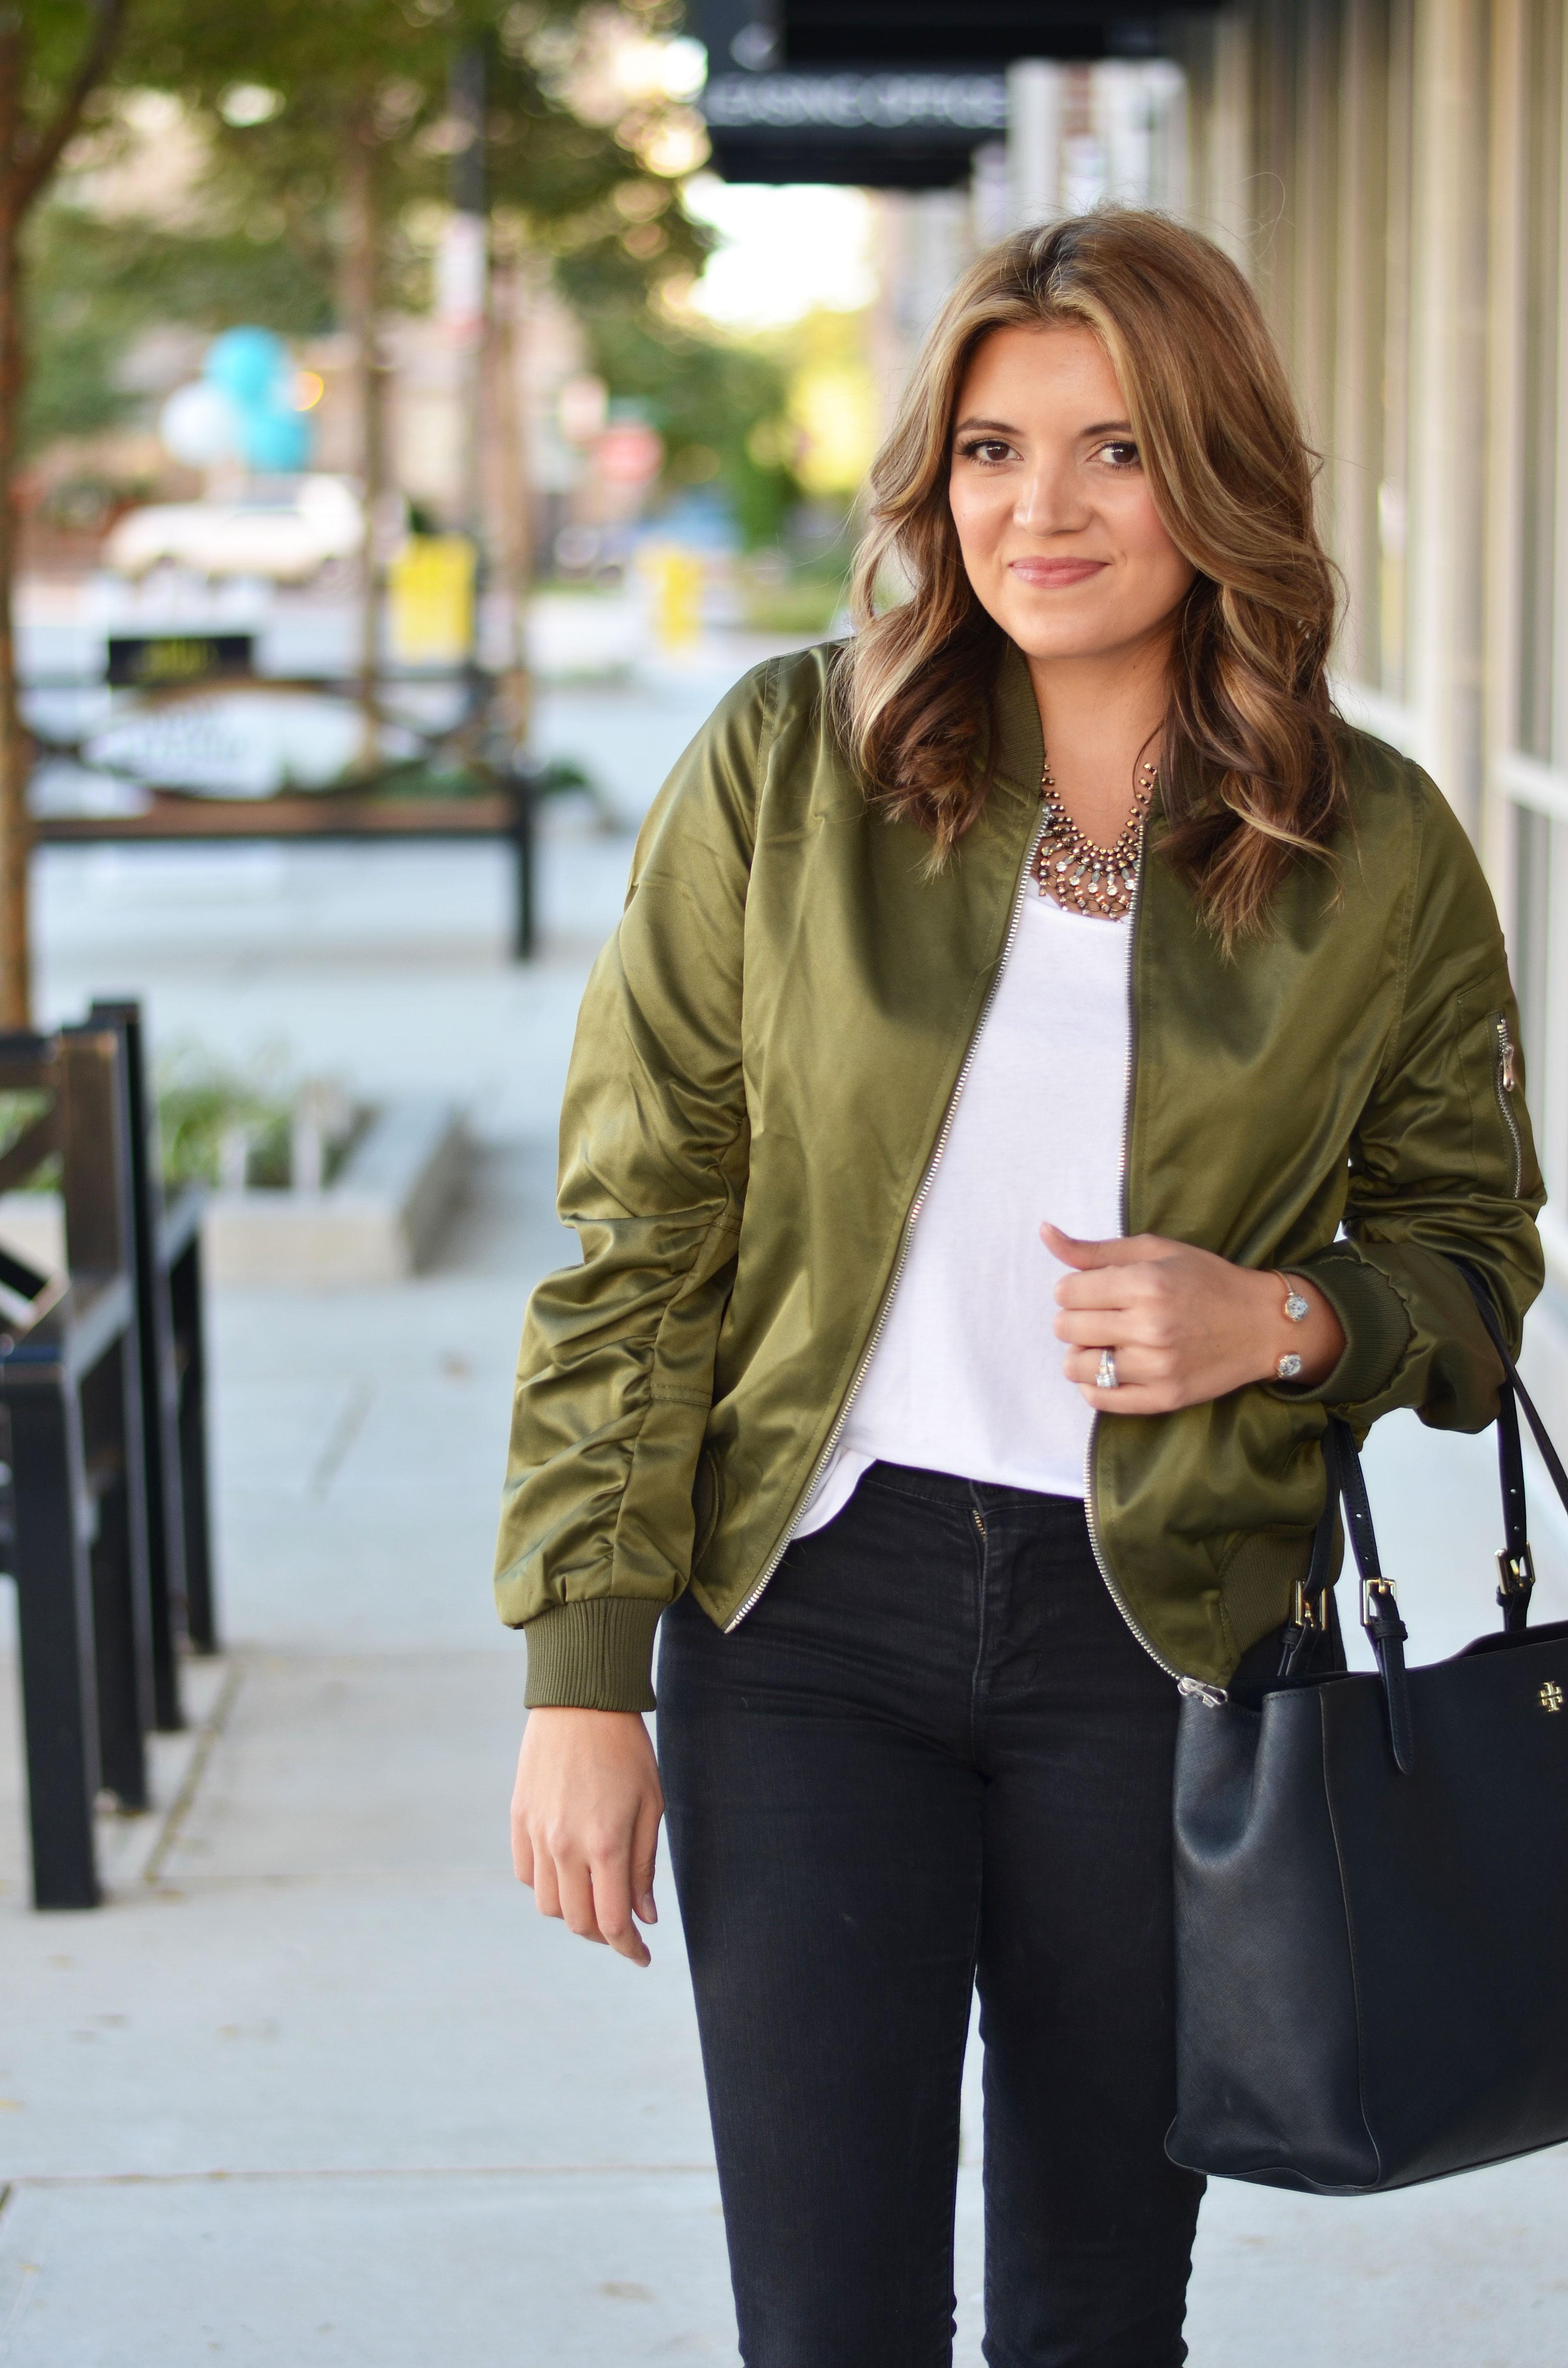 Fall akris runway, Shopping online dresses